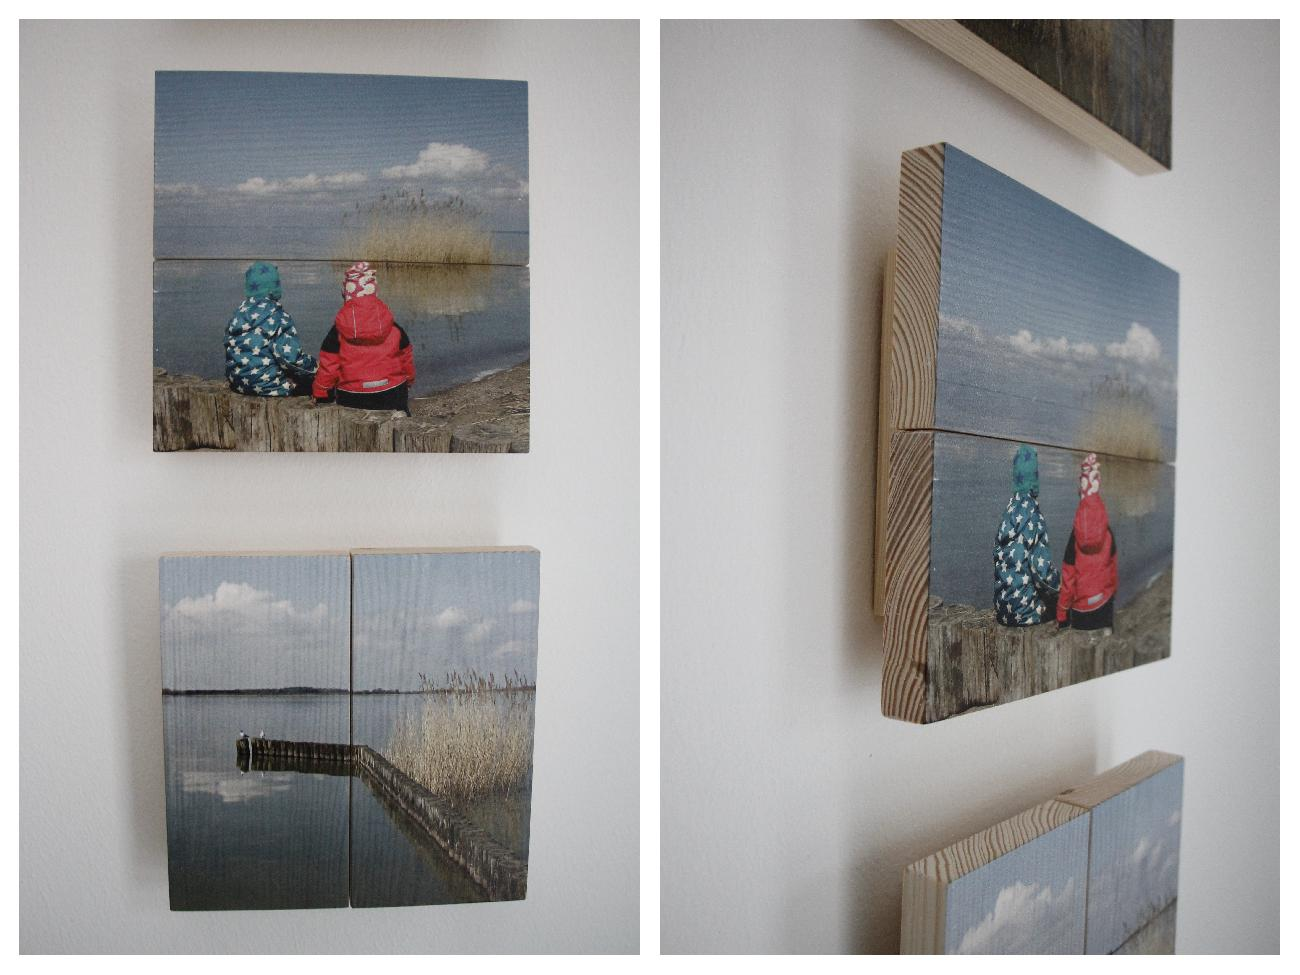 Pixum Fotos auf Holz